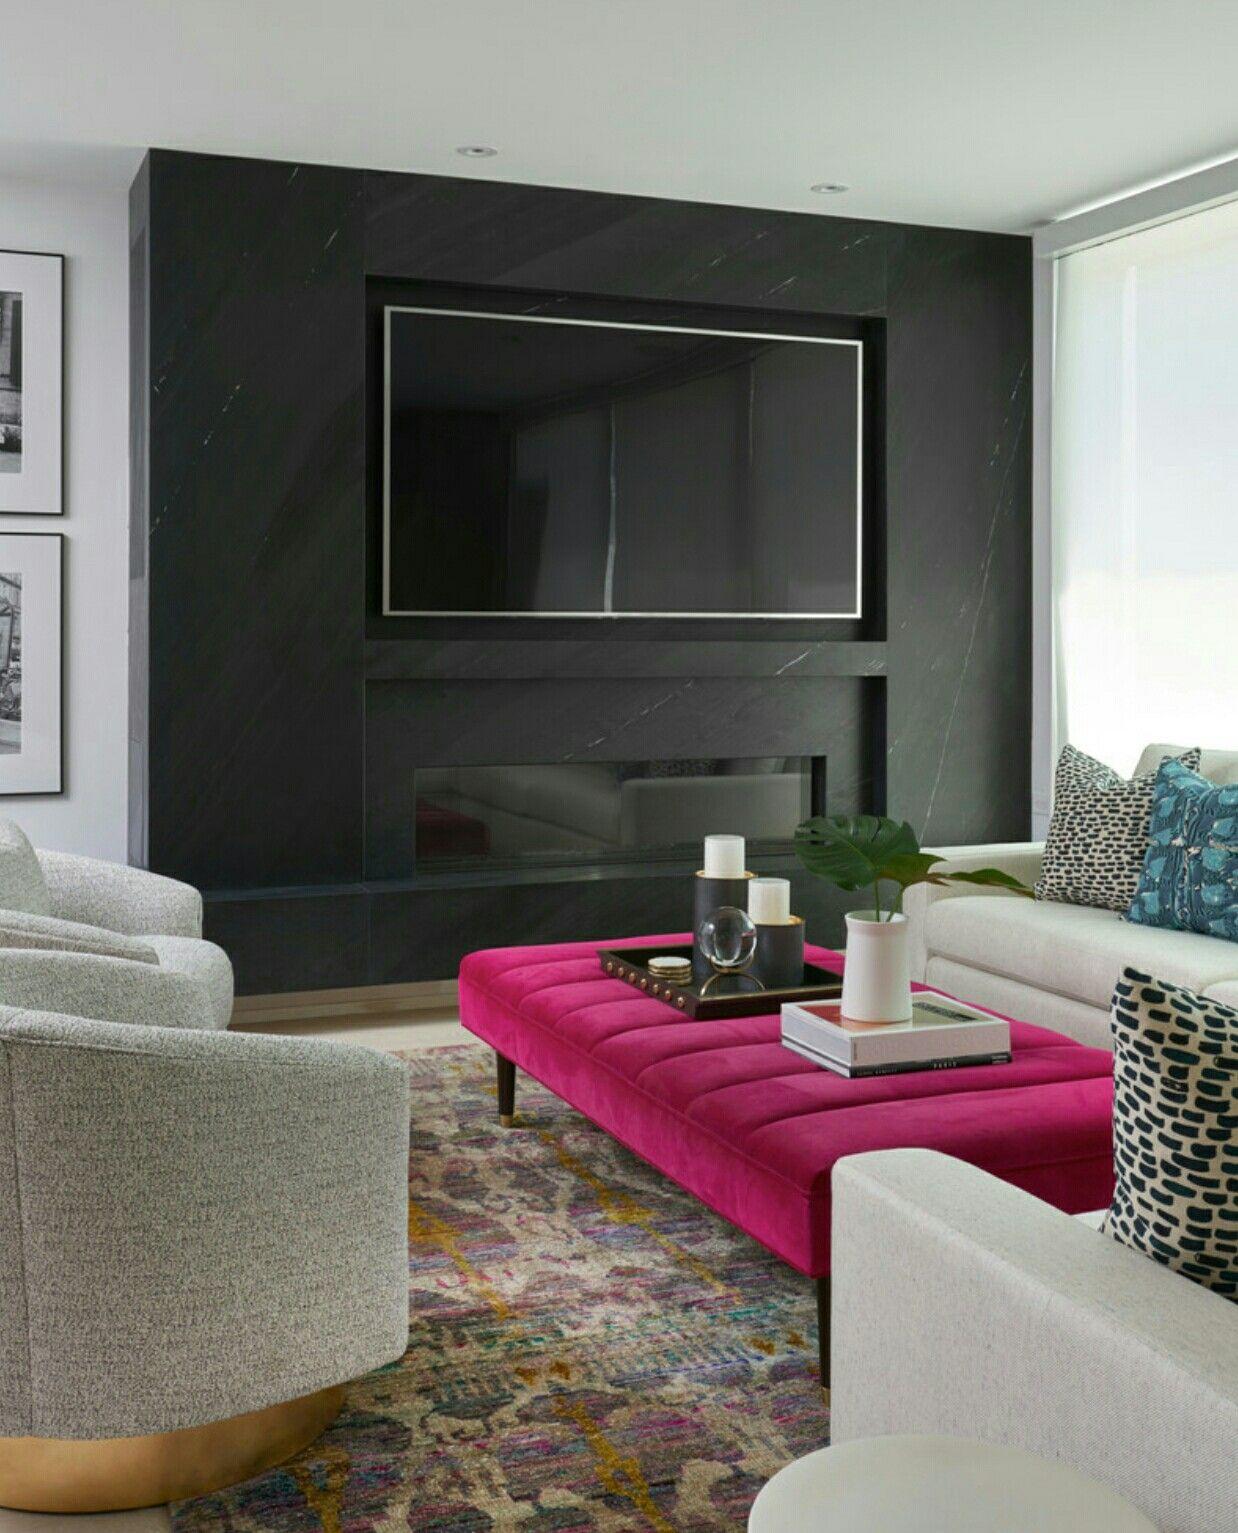 Large Flat Screen Tv Built In Trendy Living Rooms Living Room Designs Family Room Design